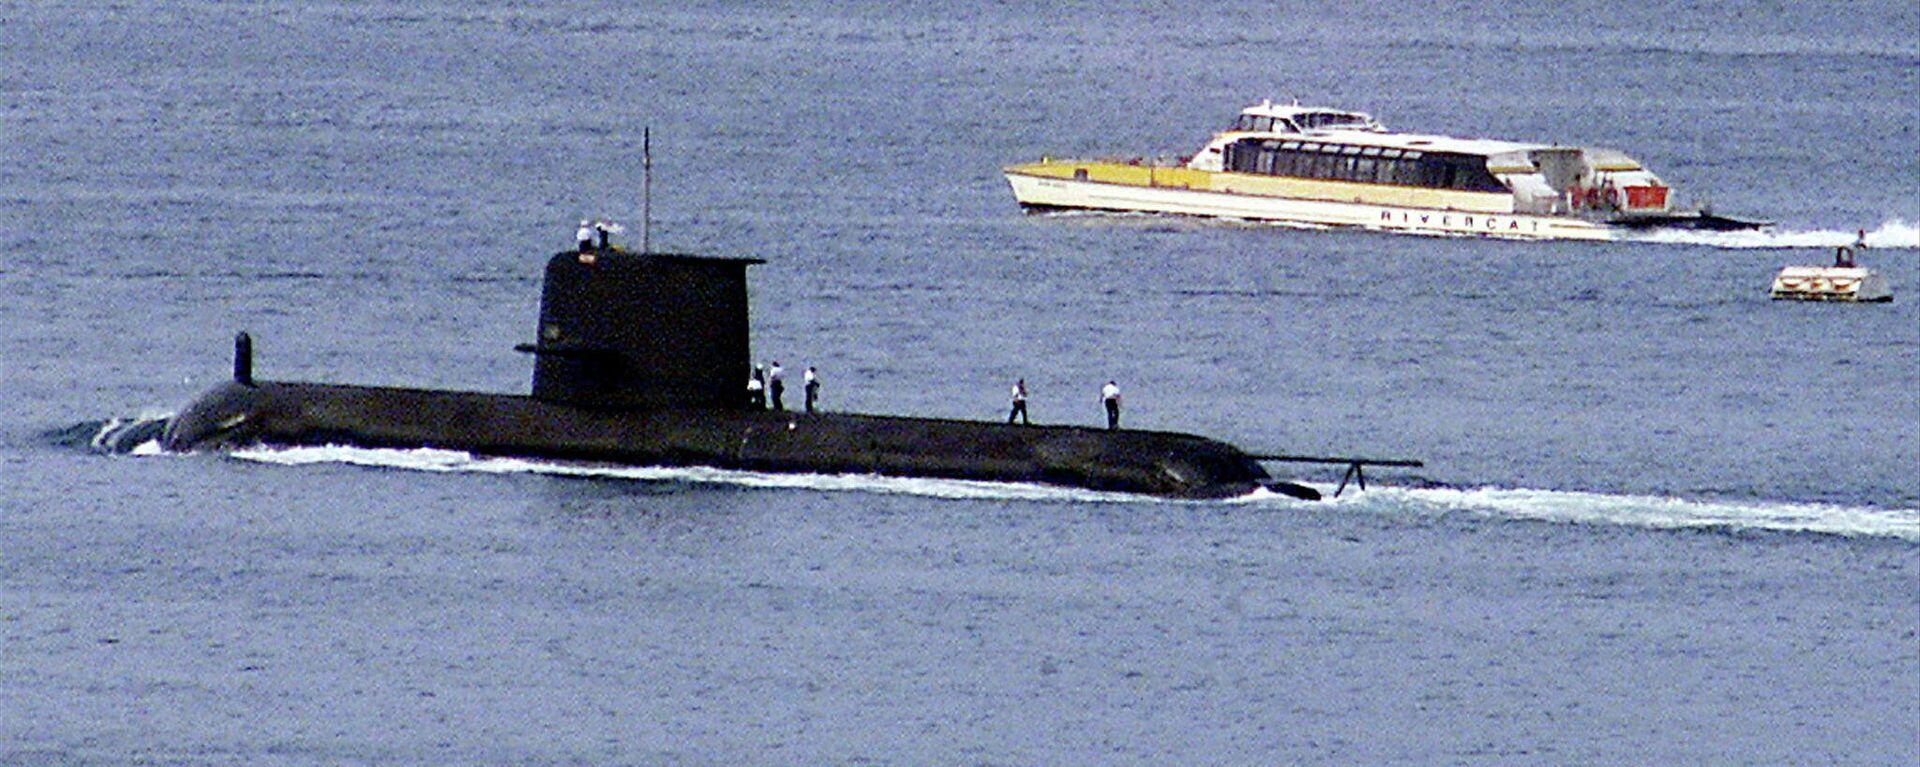 Un submarino australiano (imagen referencial) - Sputnik Mundo, 1920, 22.09.2021